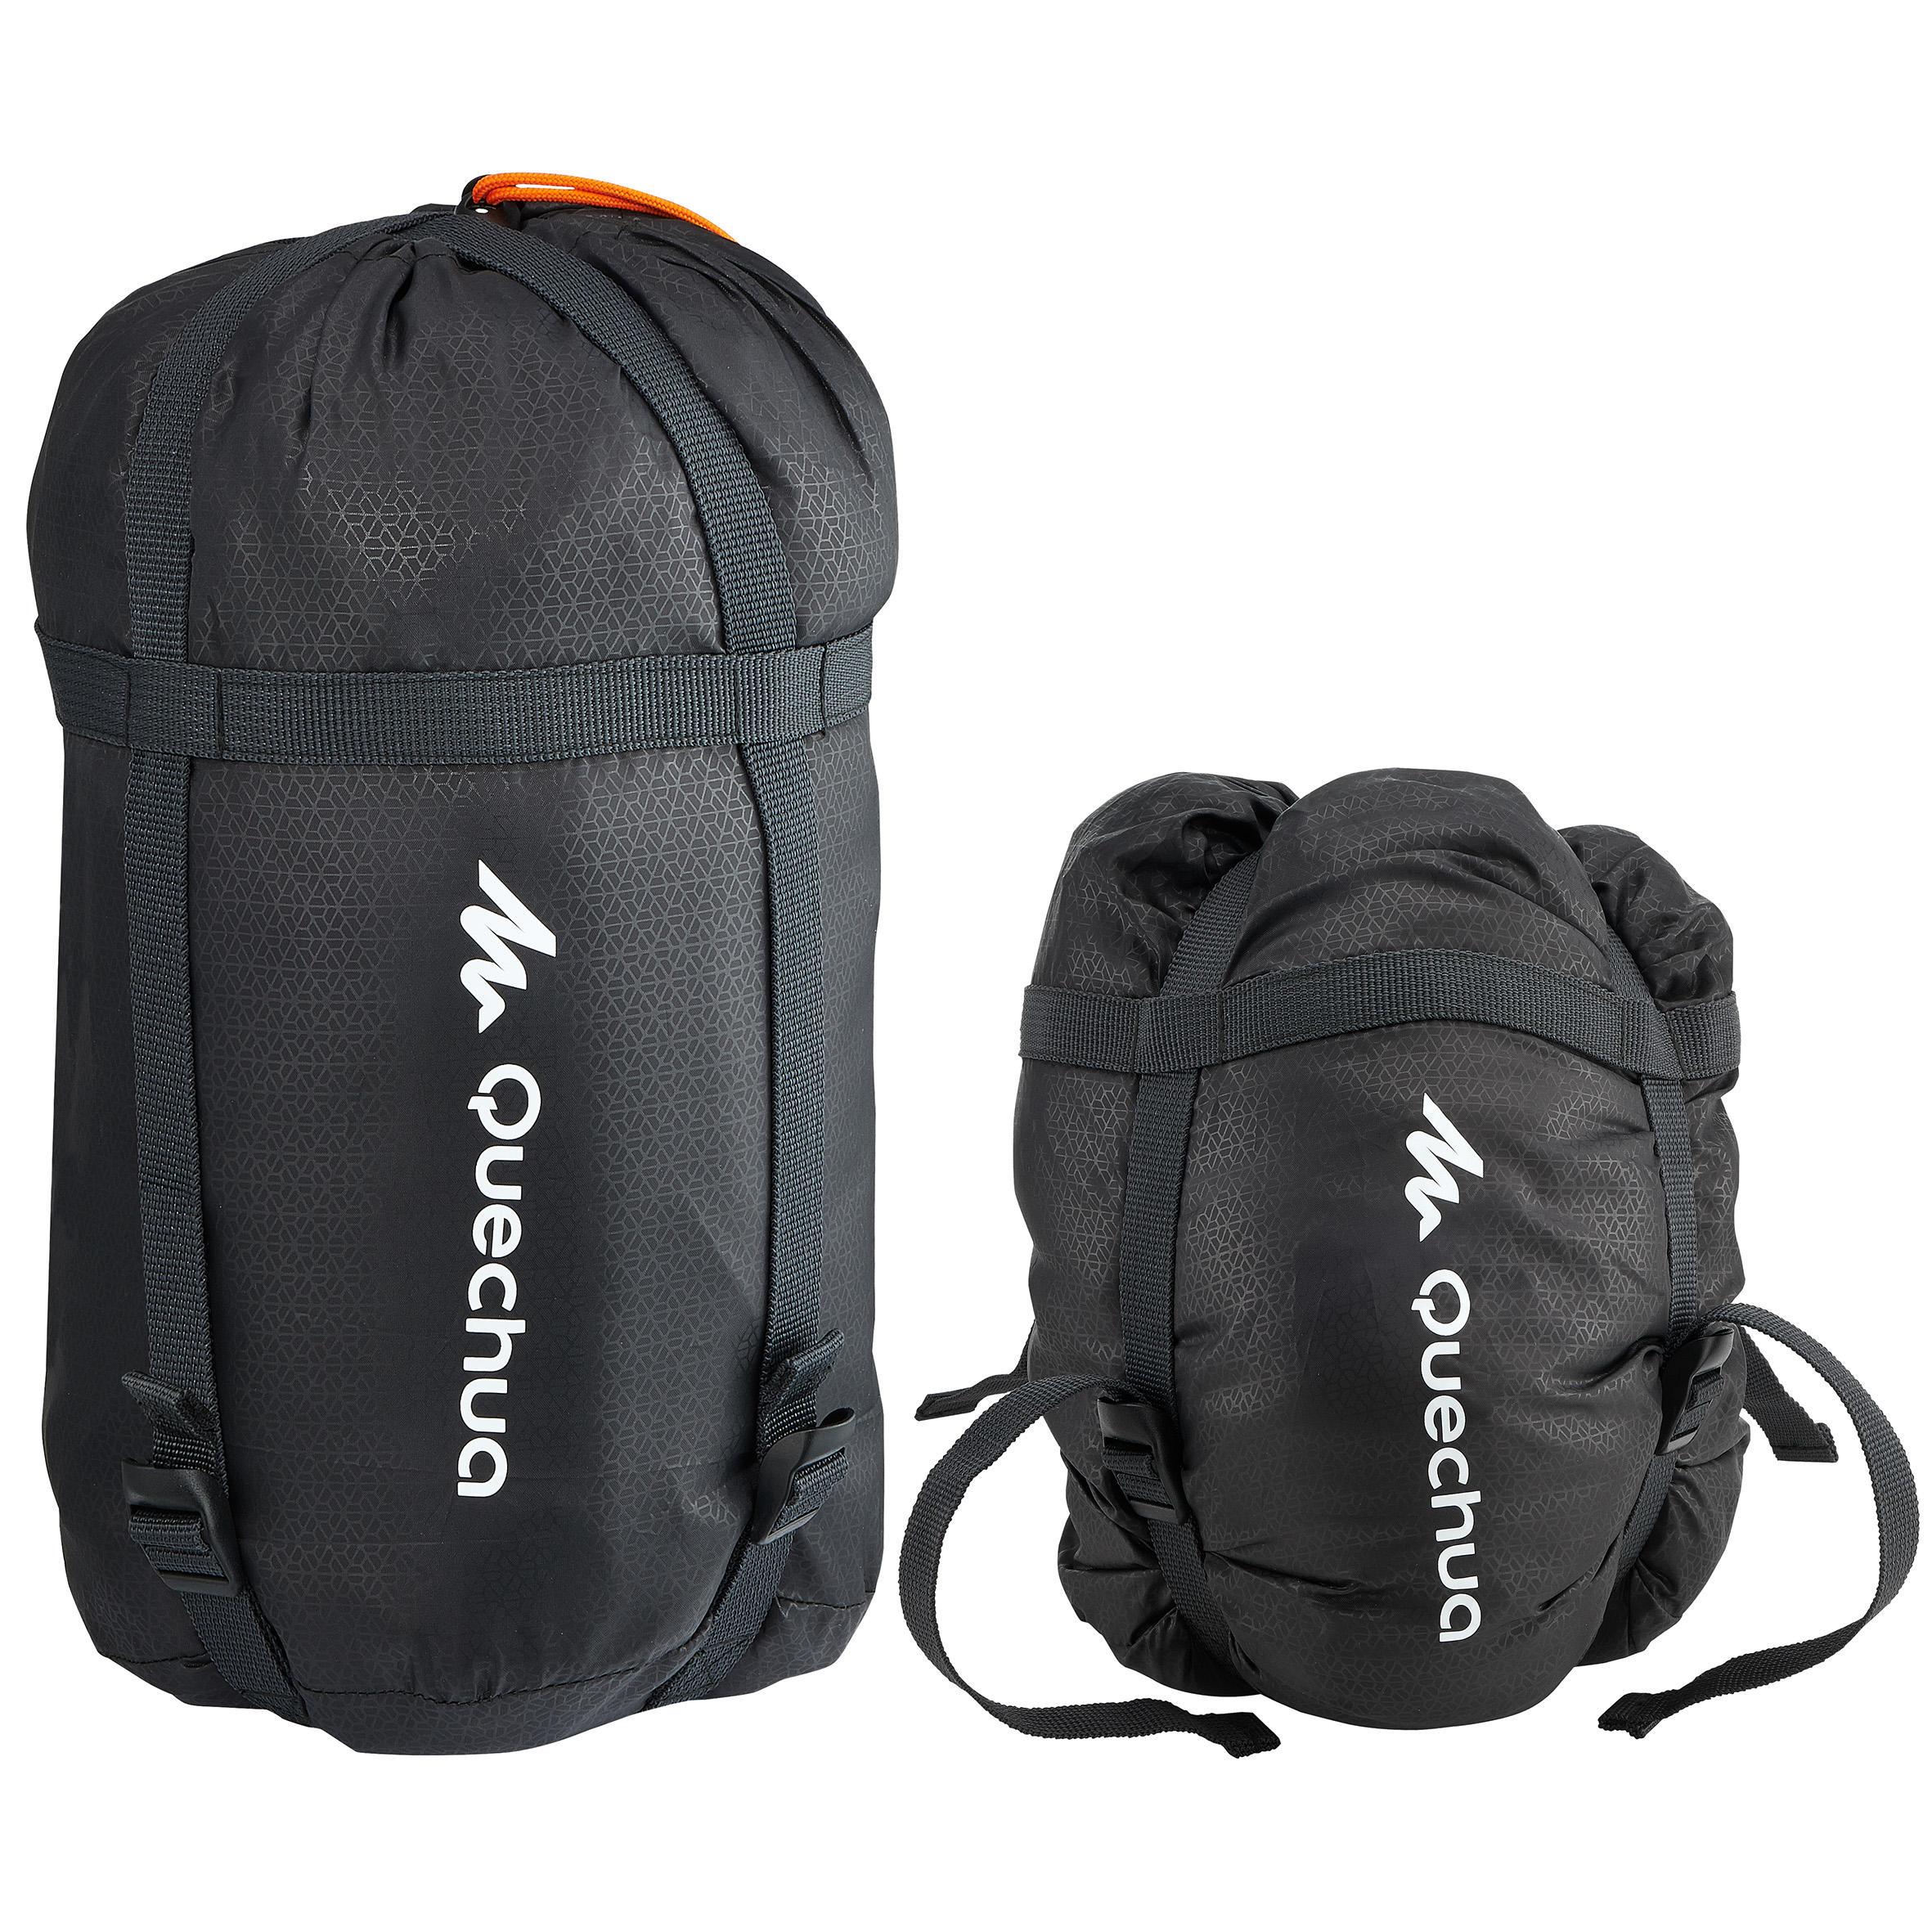 Sleeping bag Compression sack - Black